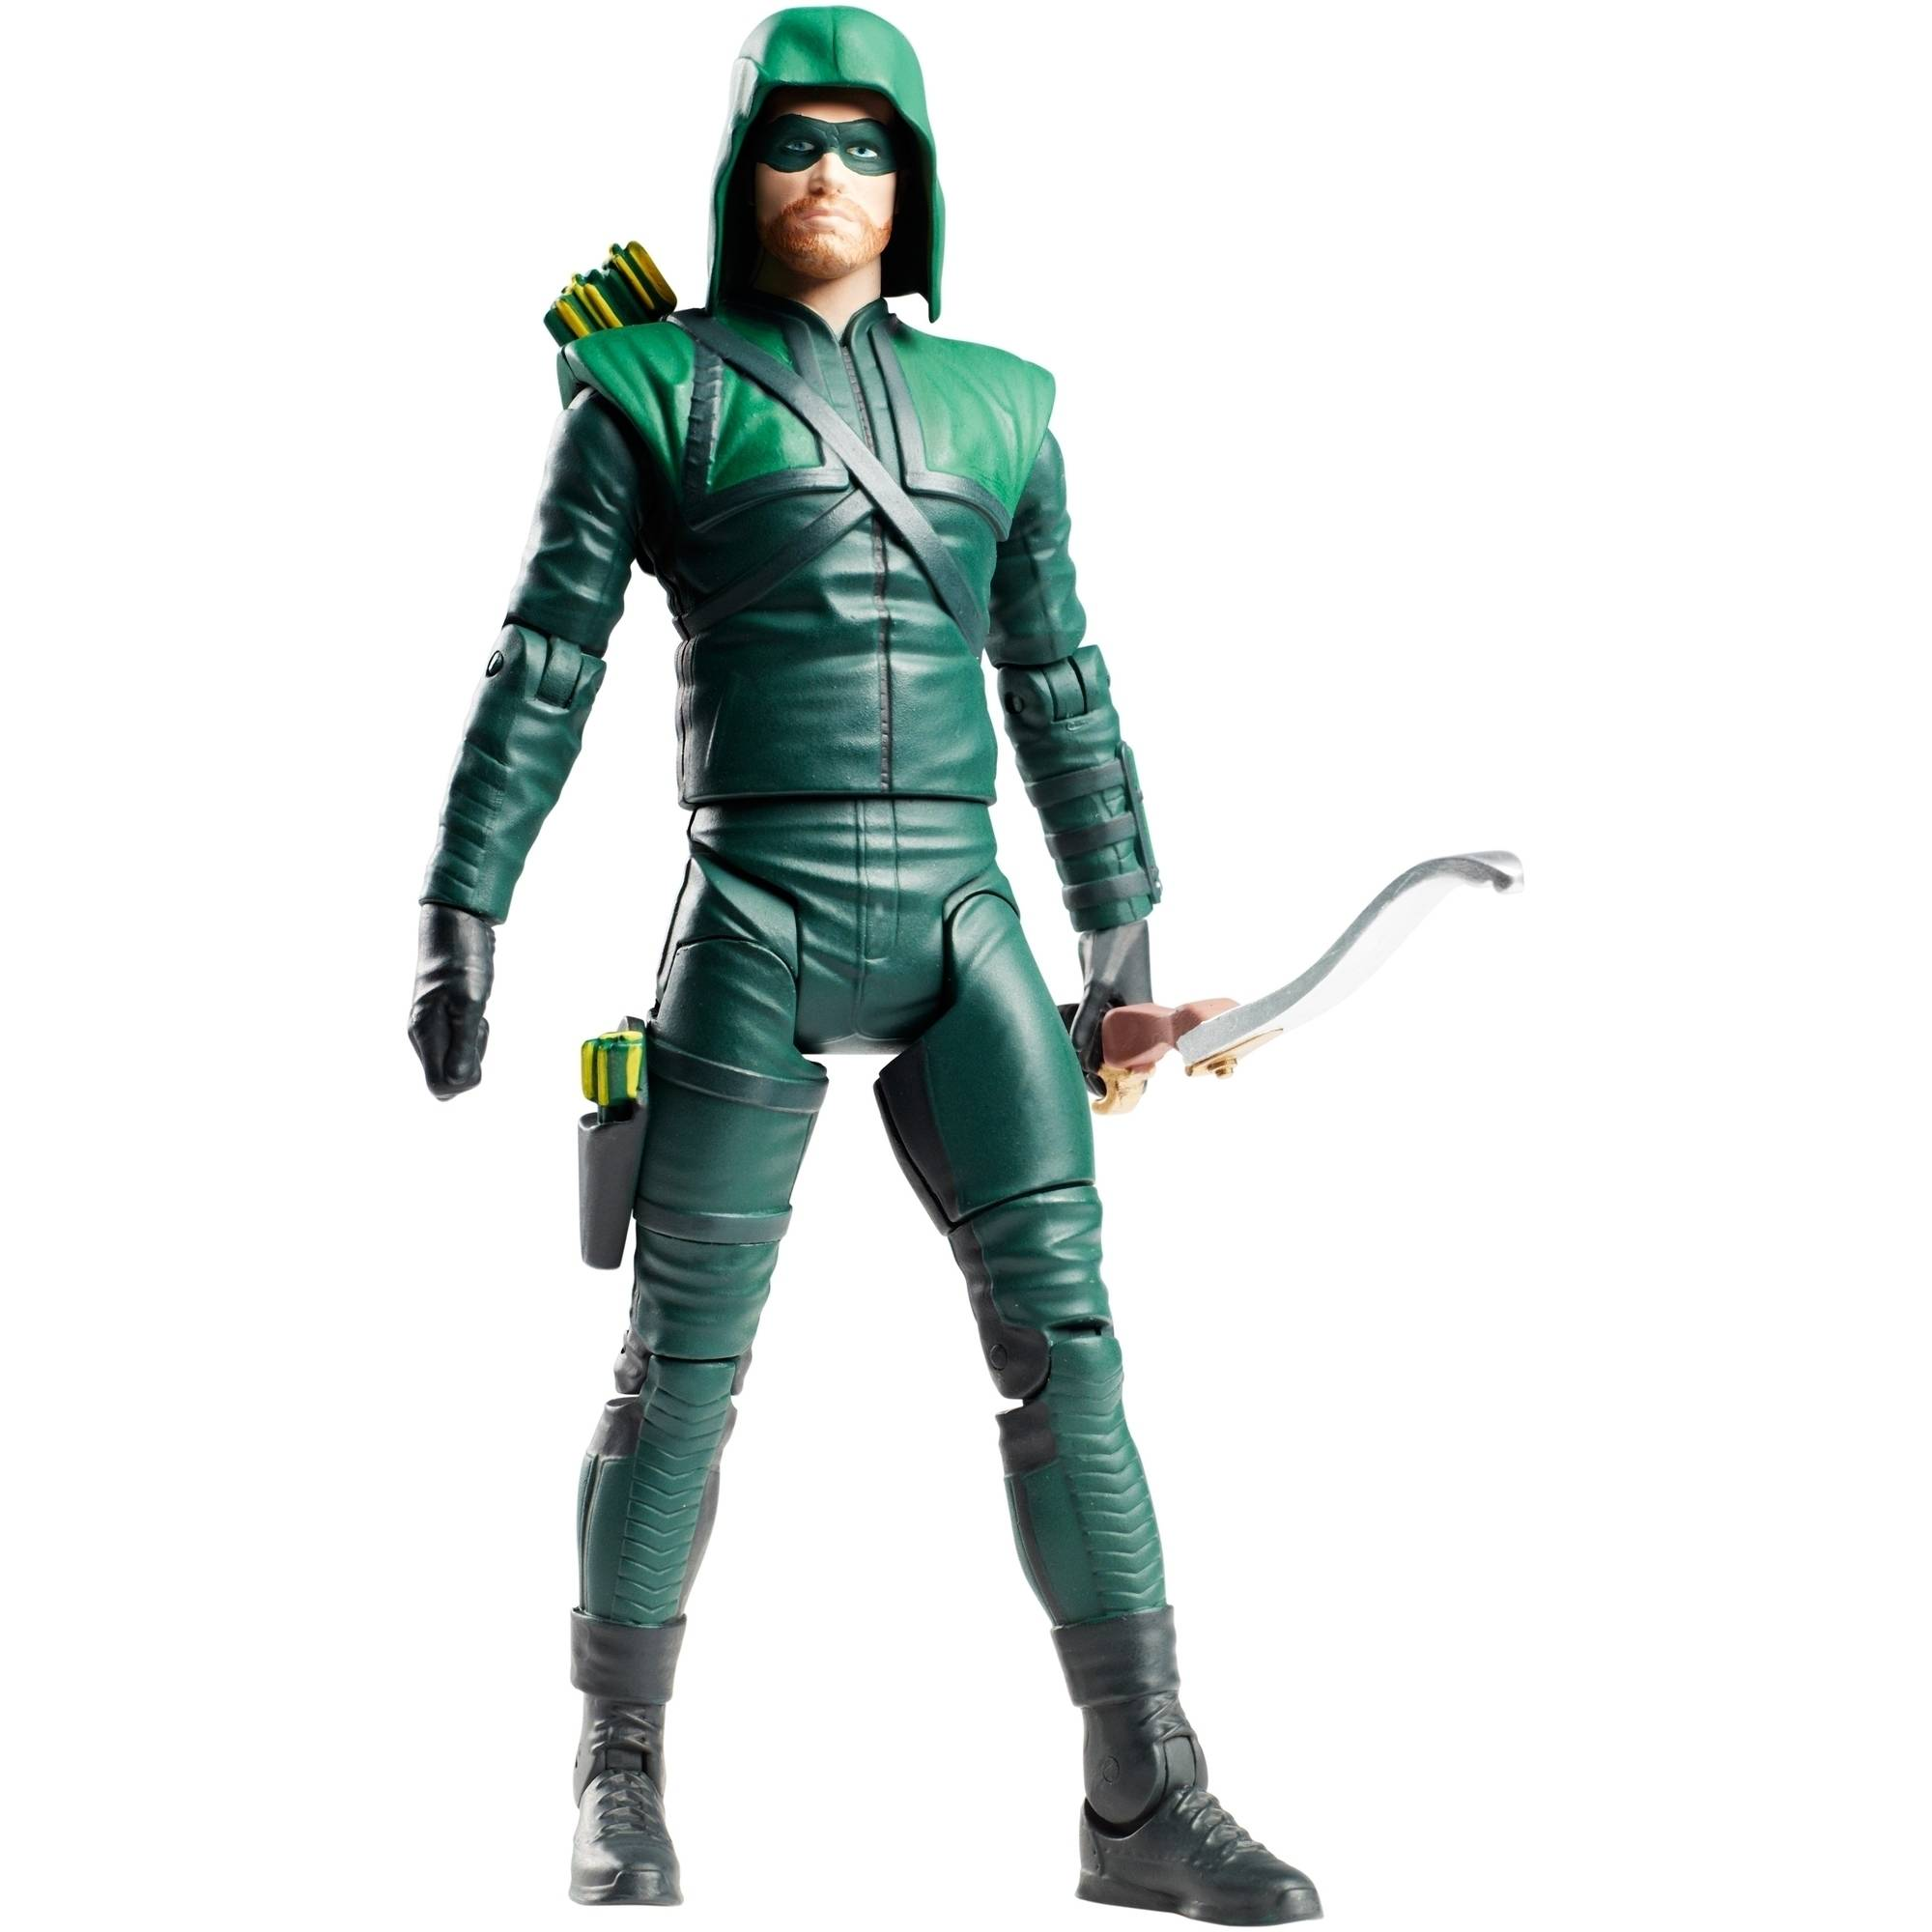 Фигурка персонажа Dc Comics Multiverse - Зеленая стрелаБэтмен против Супермена<br>Фигурка персонажа Dc Comics Multiverse - Зеленая стрела<br>